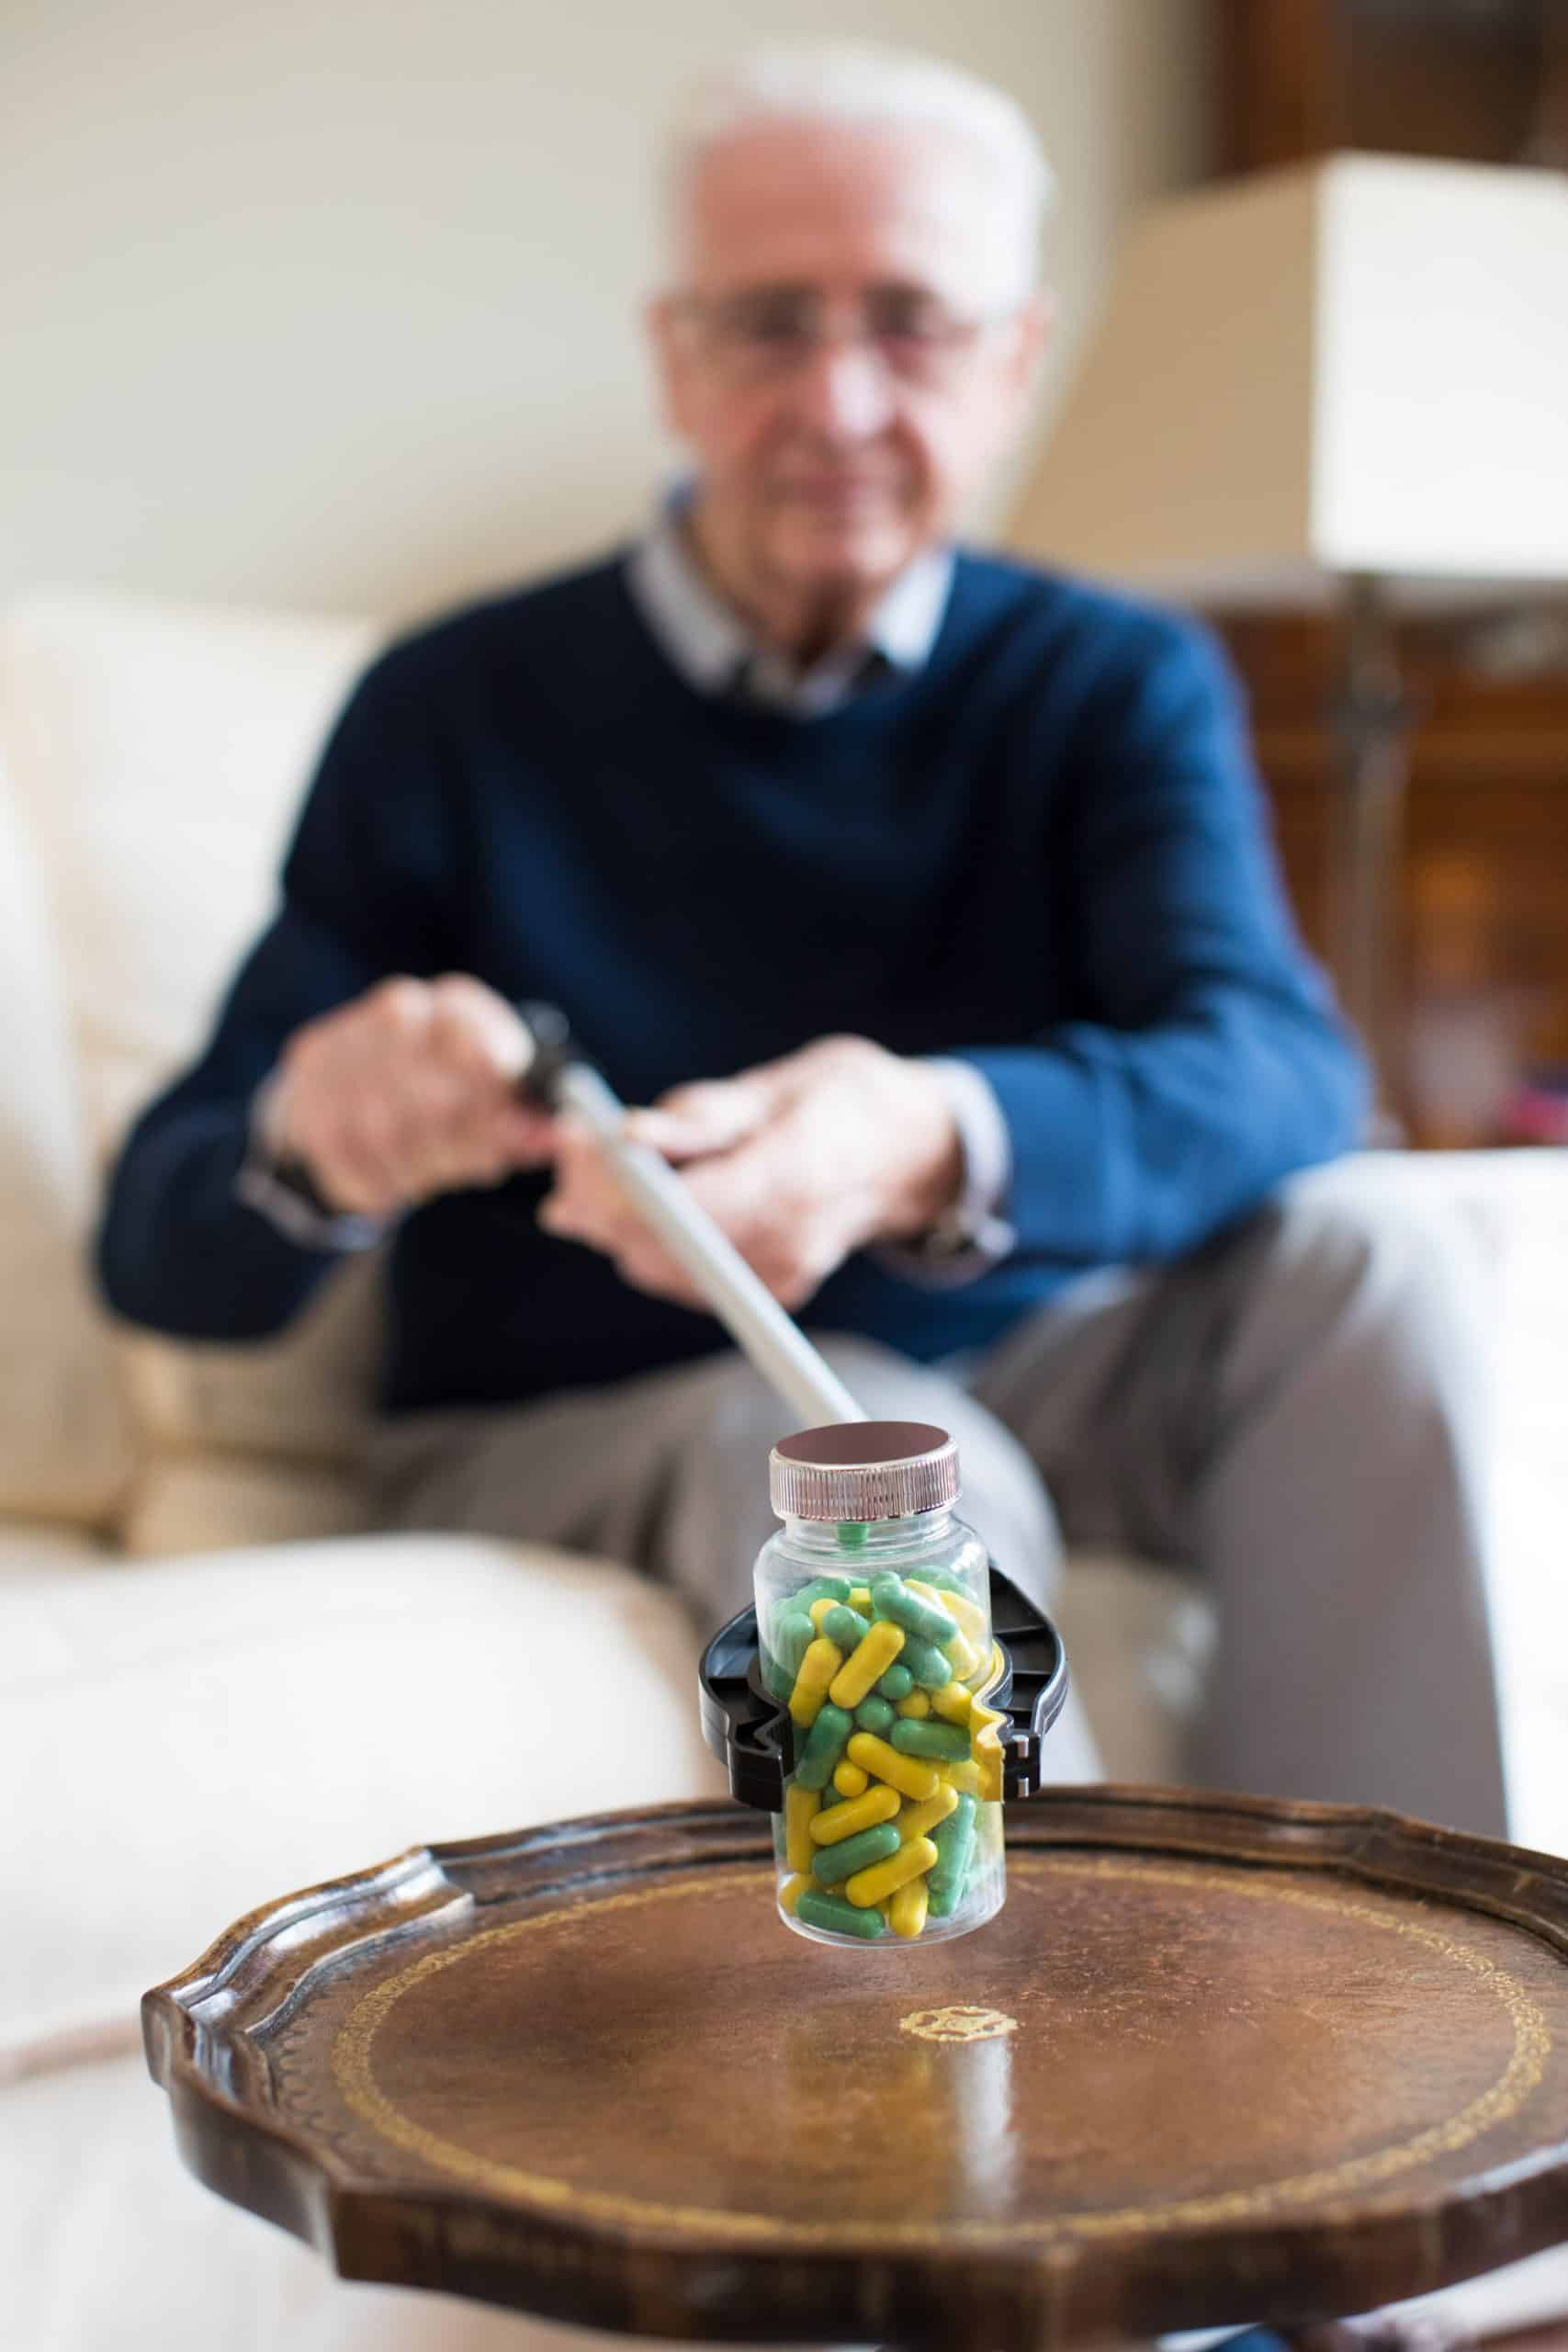 Senior Man Using Reaching Arm To Pick Up Medication At Home